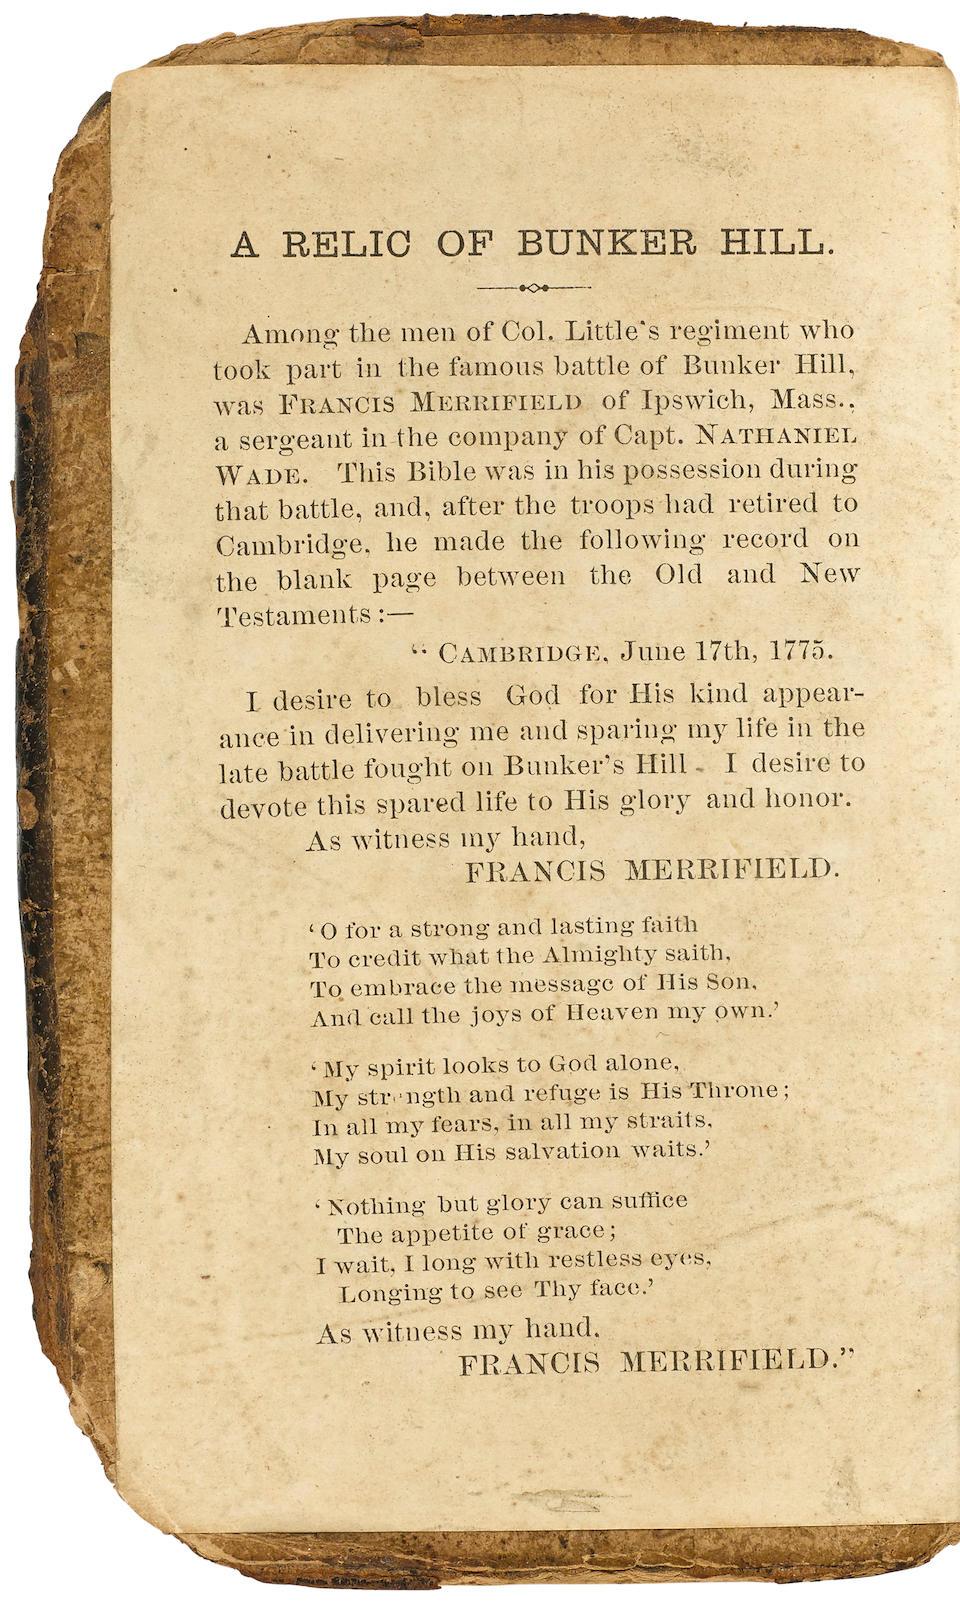 THE BUNKER HILL BIBLE OF FRANCIS MERRIFIELD. The Holy Bible.  Edinburgh: printed by Adrian Watkins, 1755.